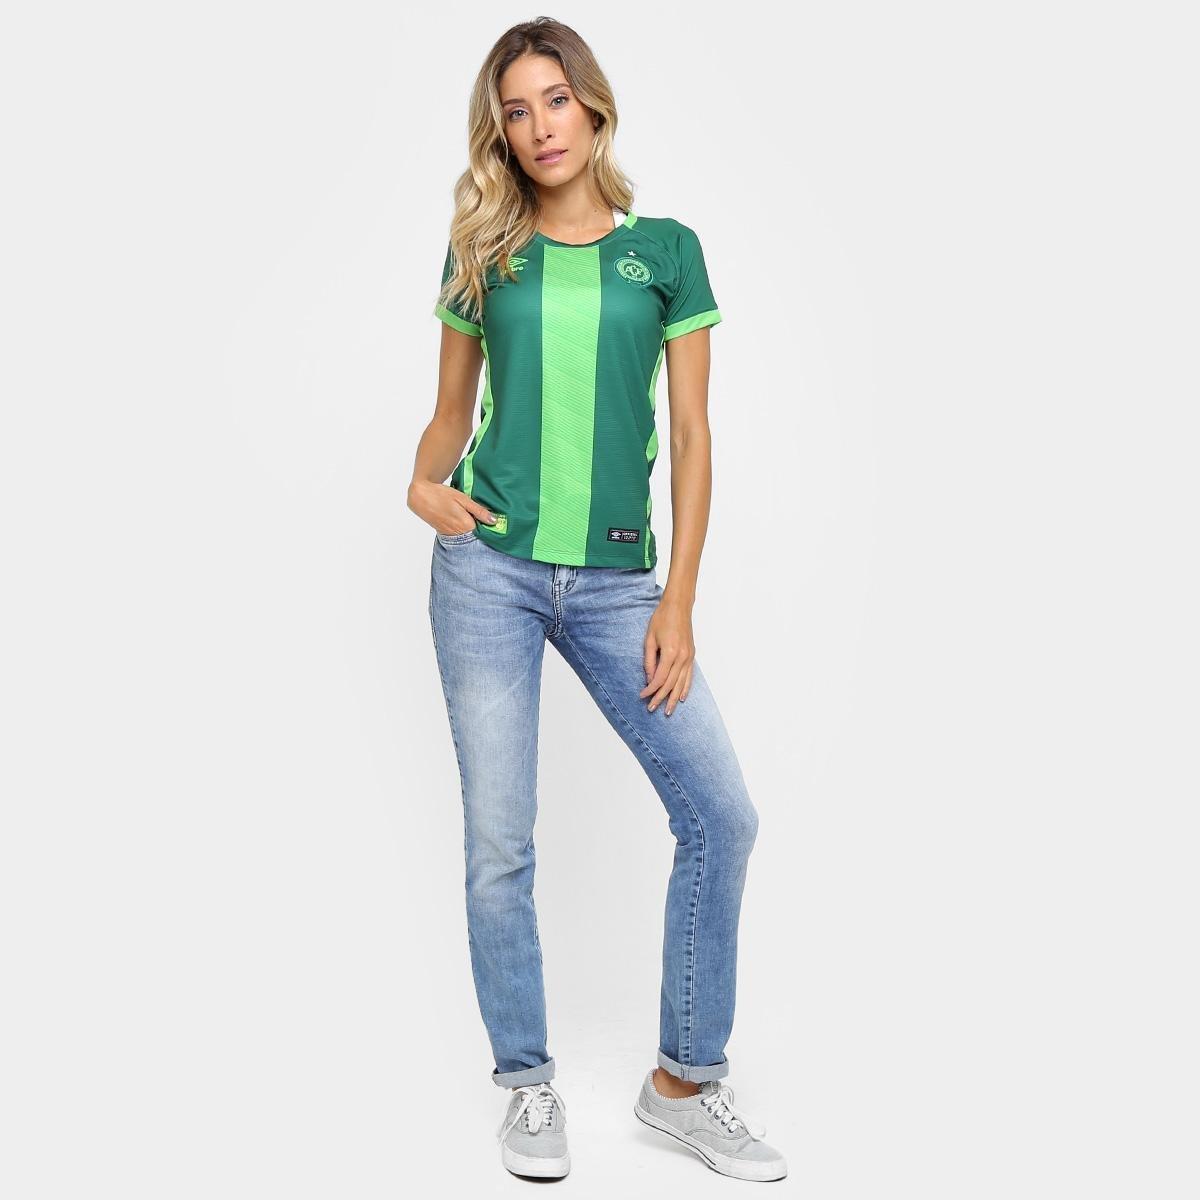 Feminina Chapecoense 16 Torcedor s III Camisa nº Umbro Verde 17 1UBABZx